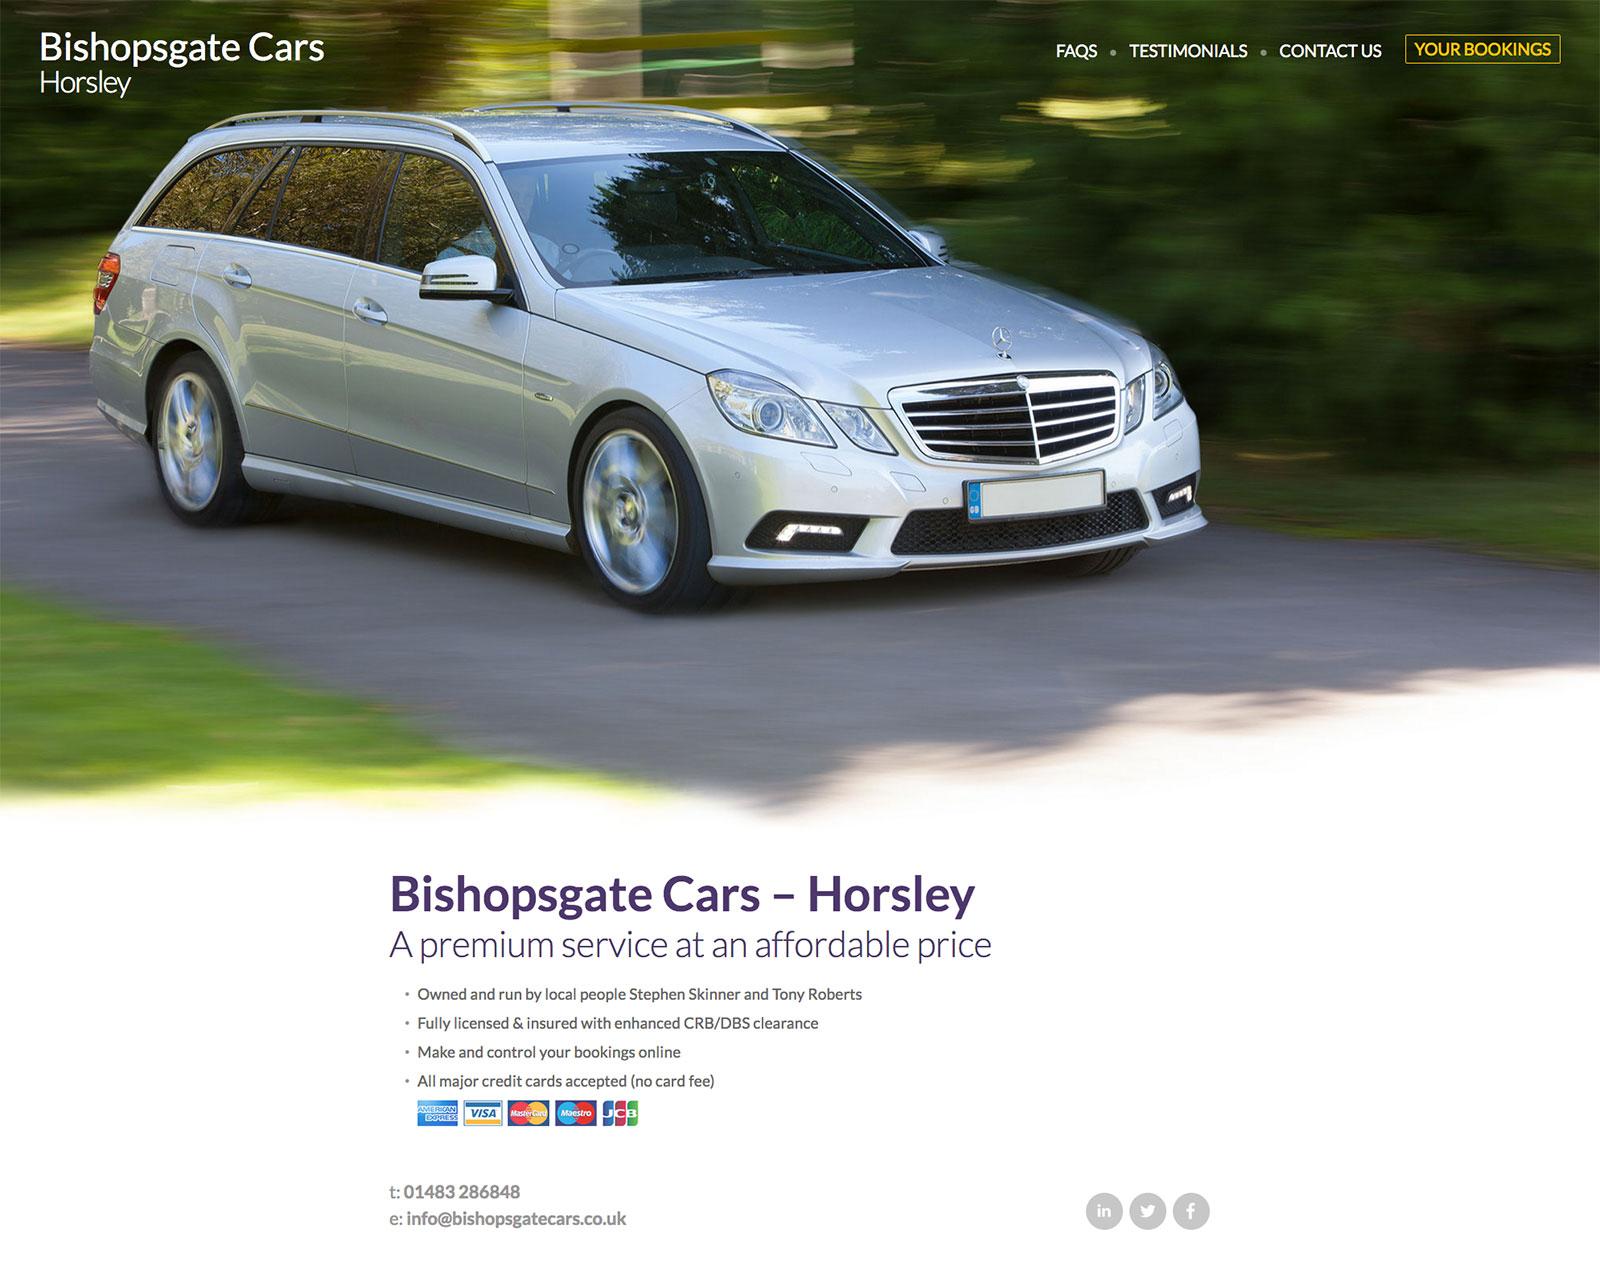 Bishopsgate Cars